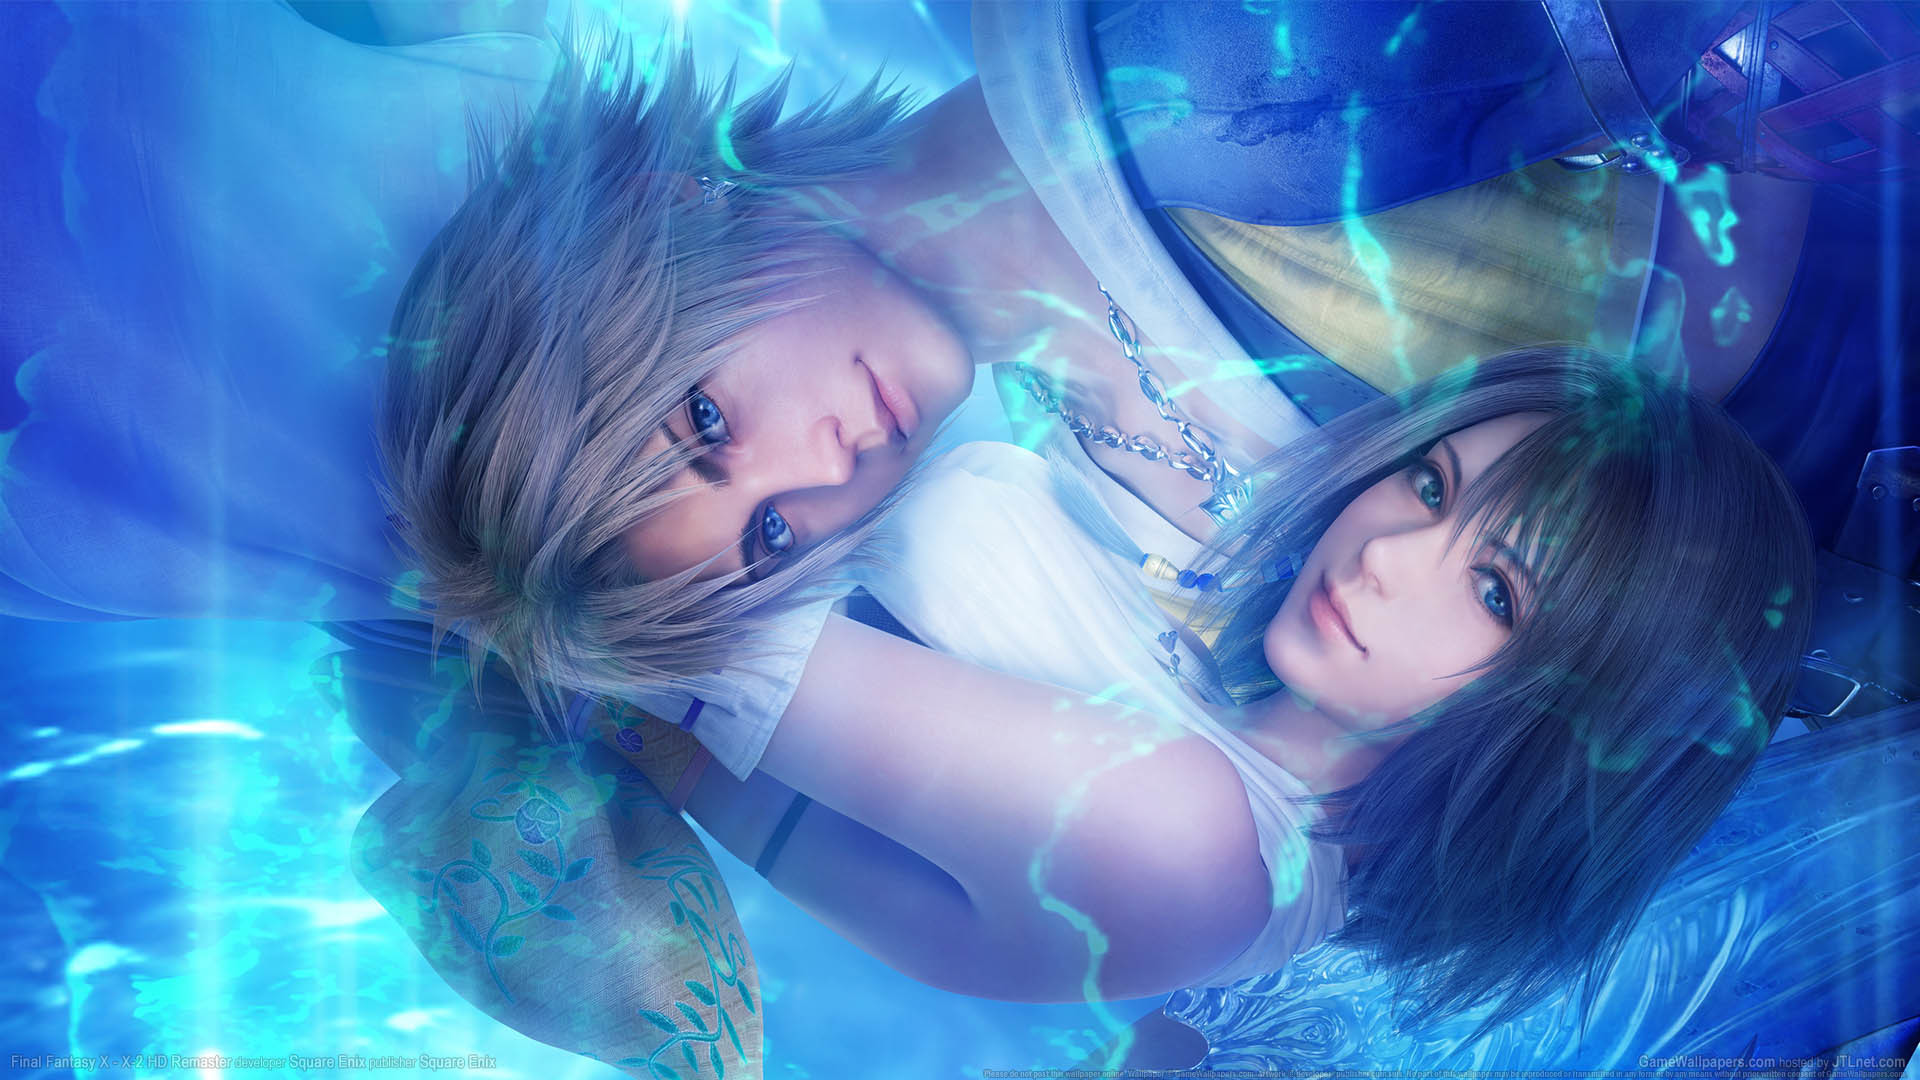 … Final Fantasy X – X-2 HD wallpaper or background 01